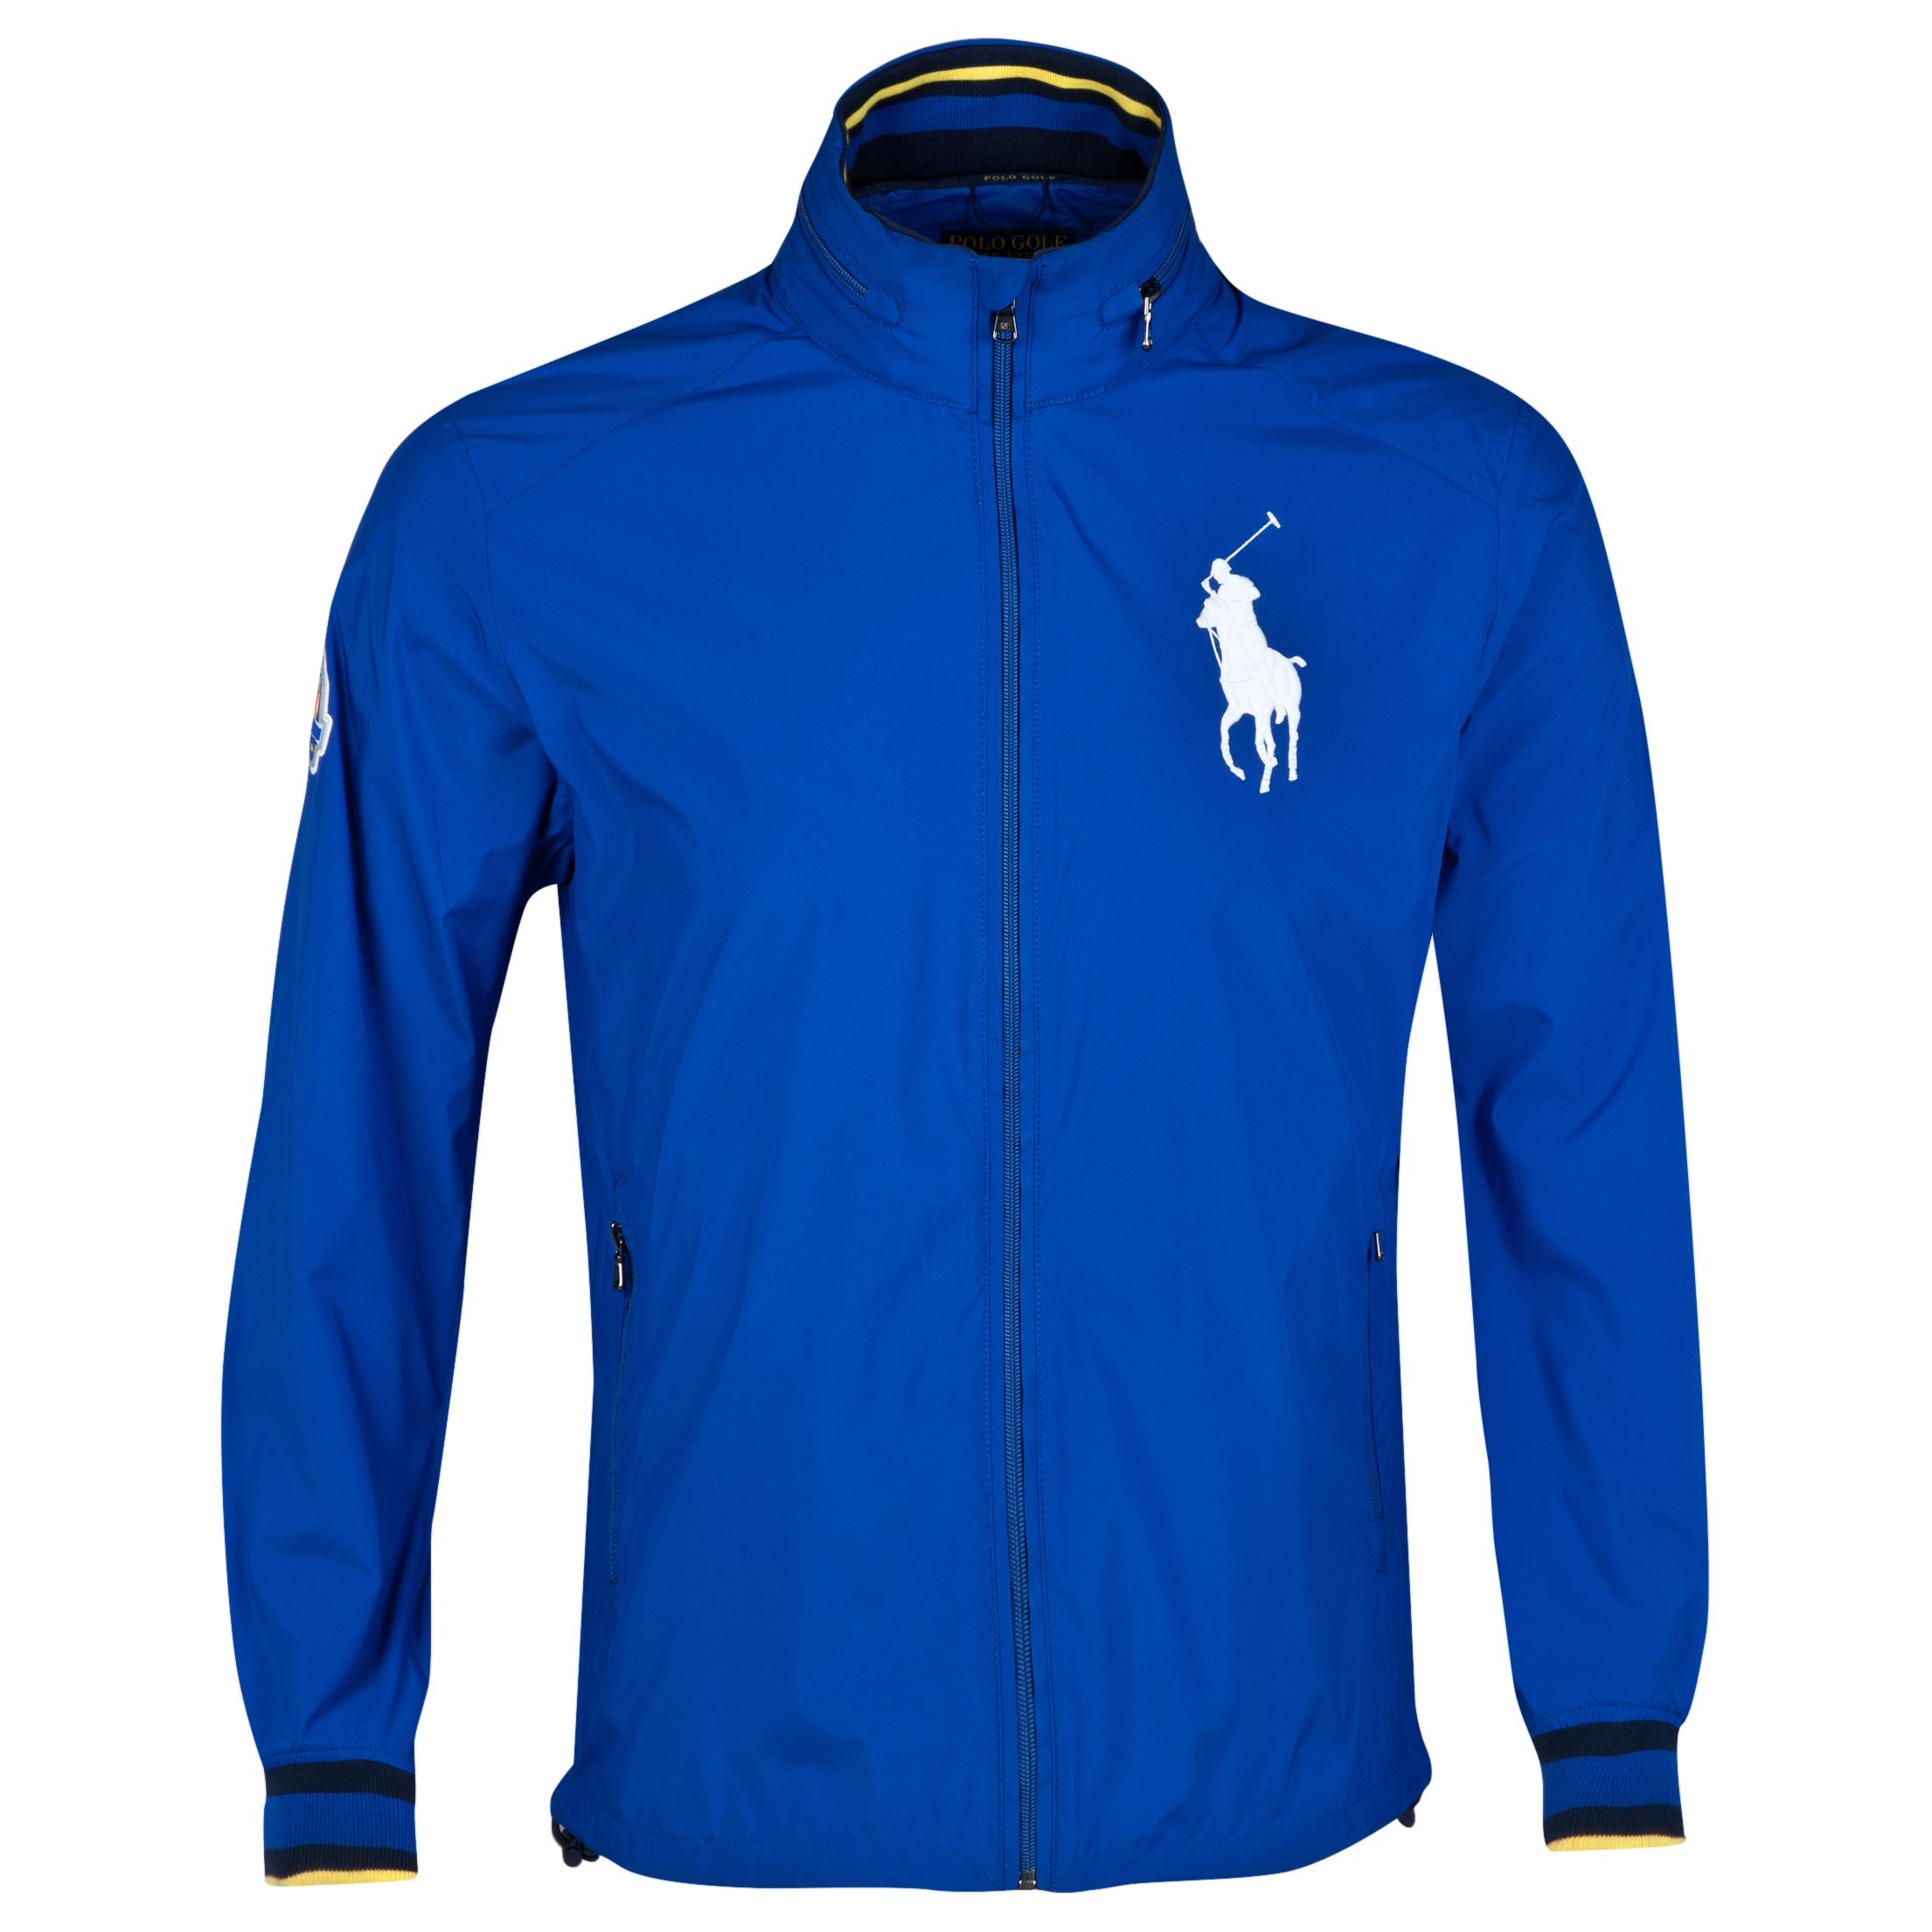 The 2014 Ryder Cup Ralph Lauren Big Pony Hooded Windbreaker Royal Blue